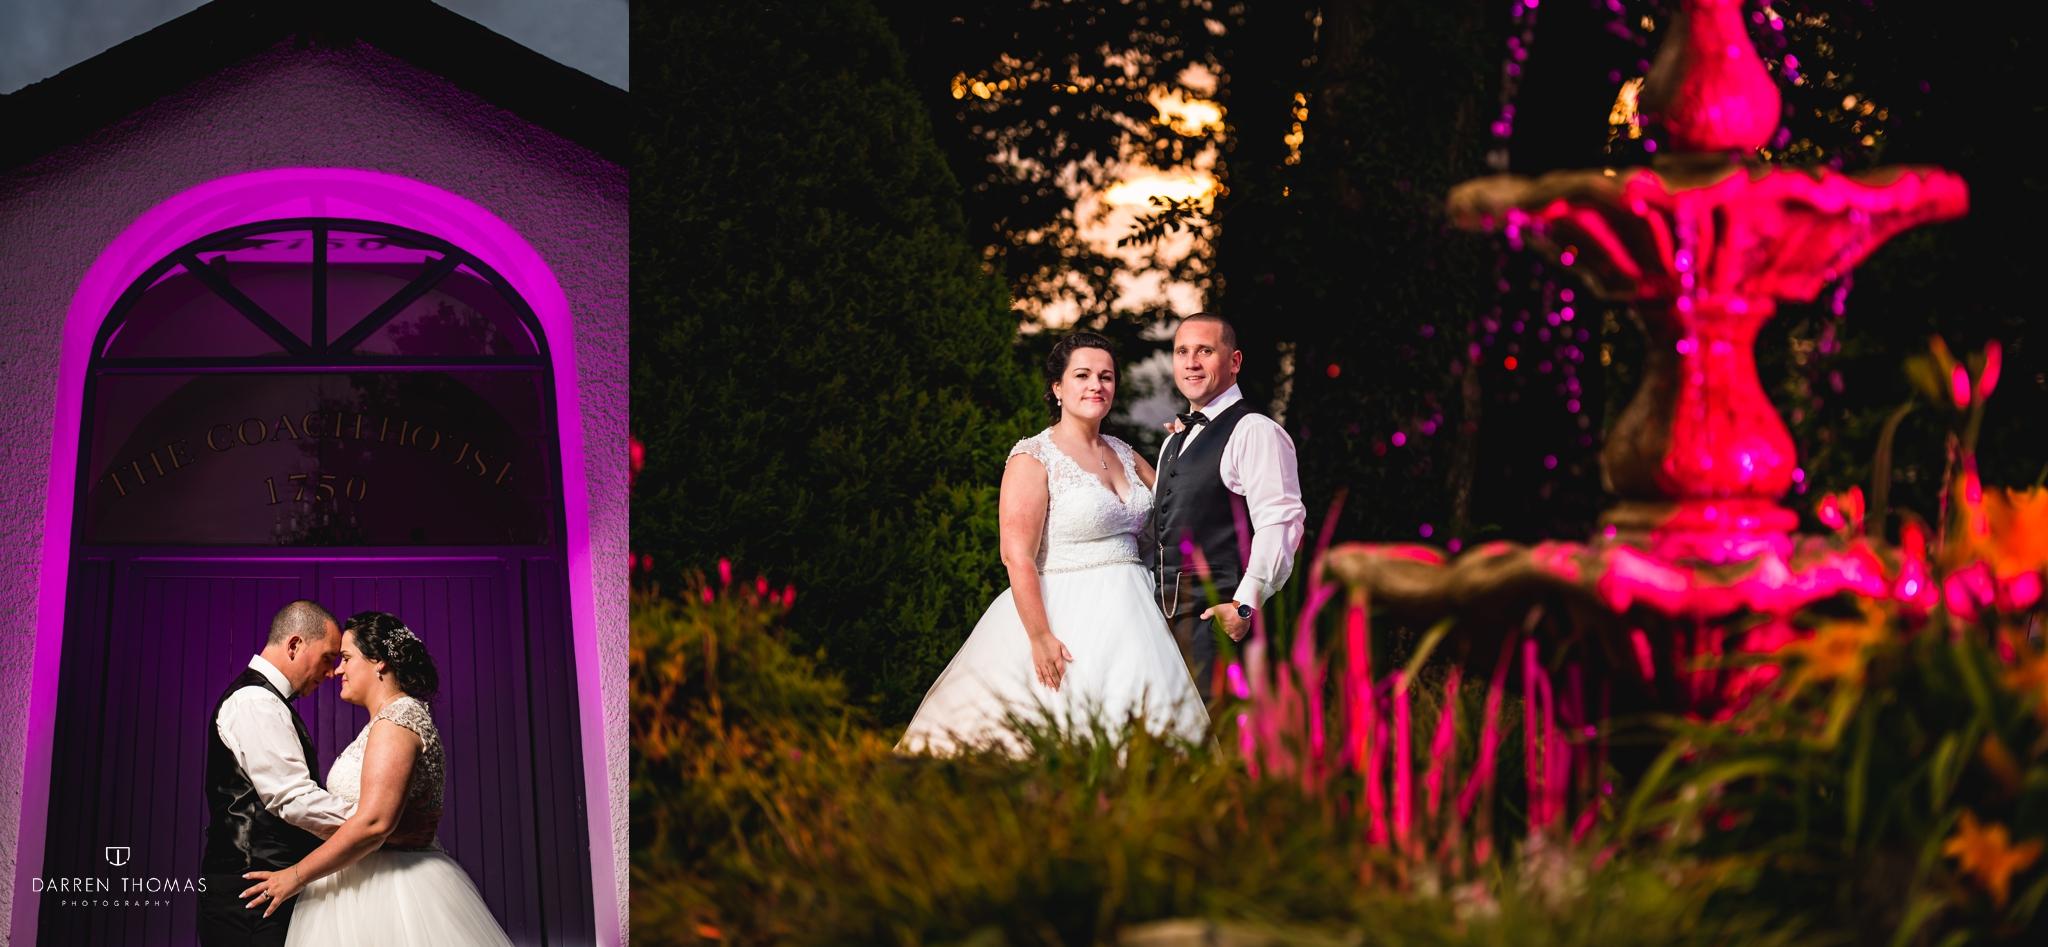 Llechwen-hall-wedding-photography22.jpg